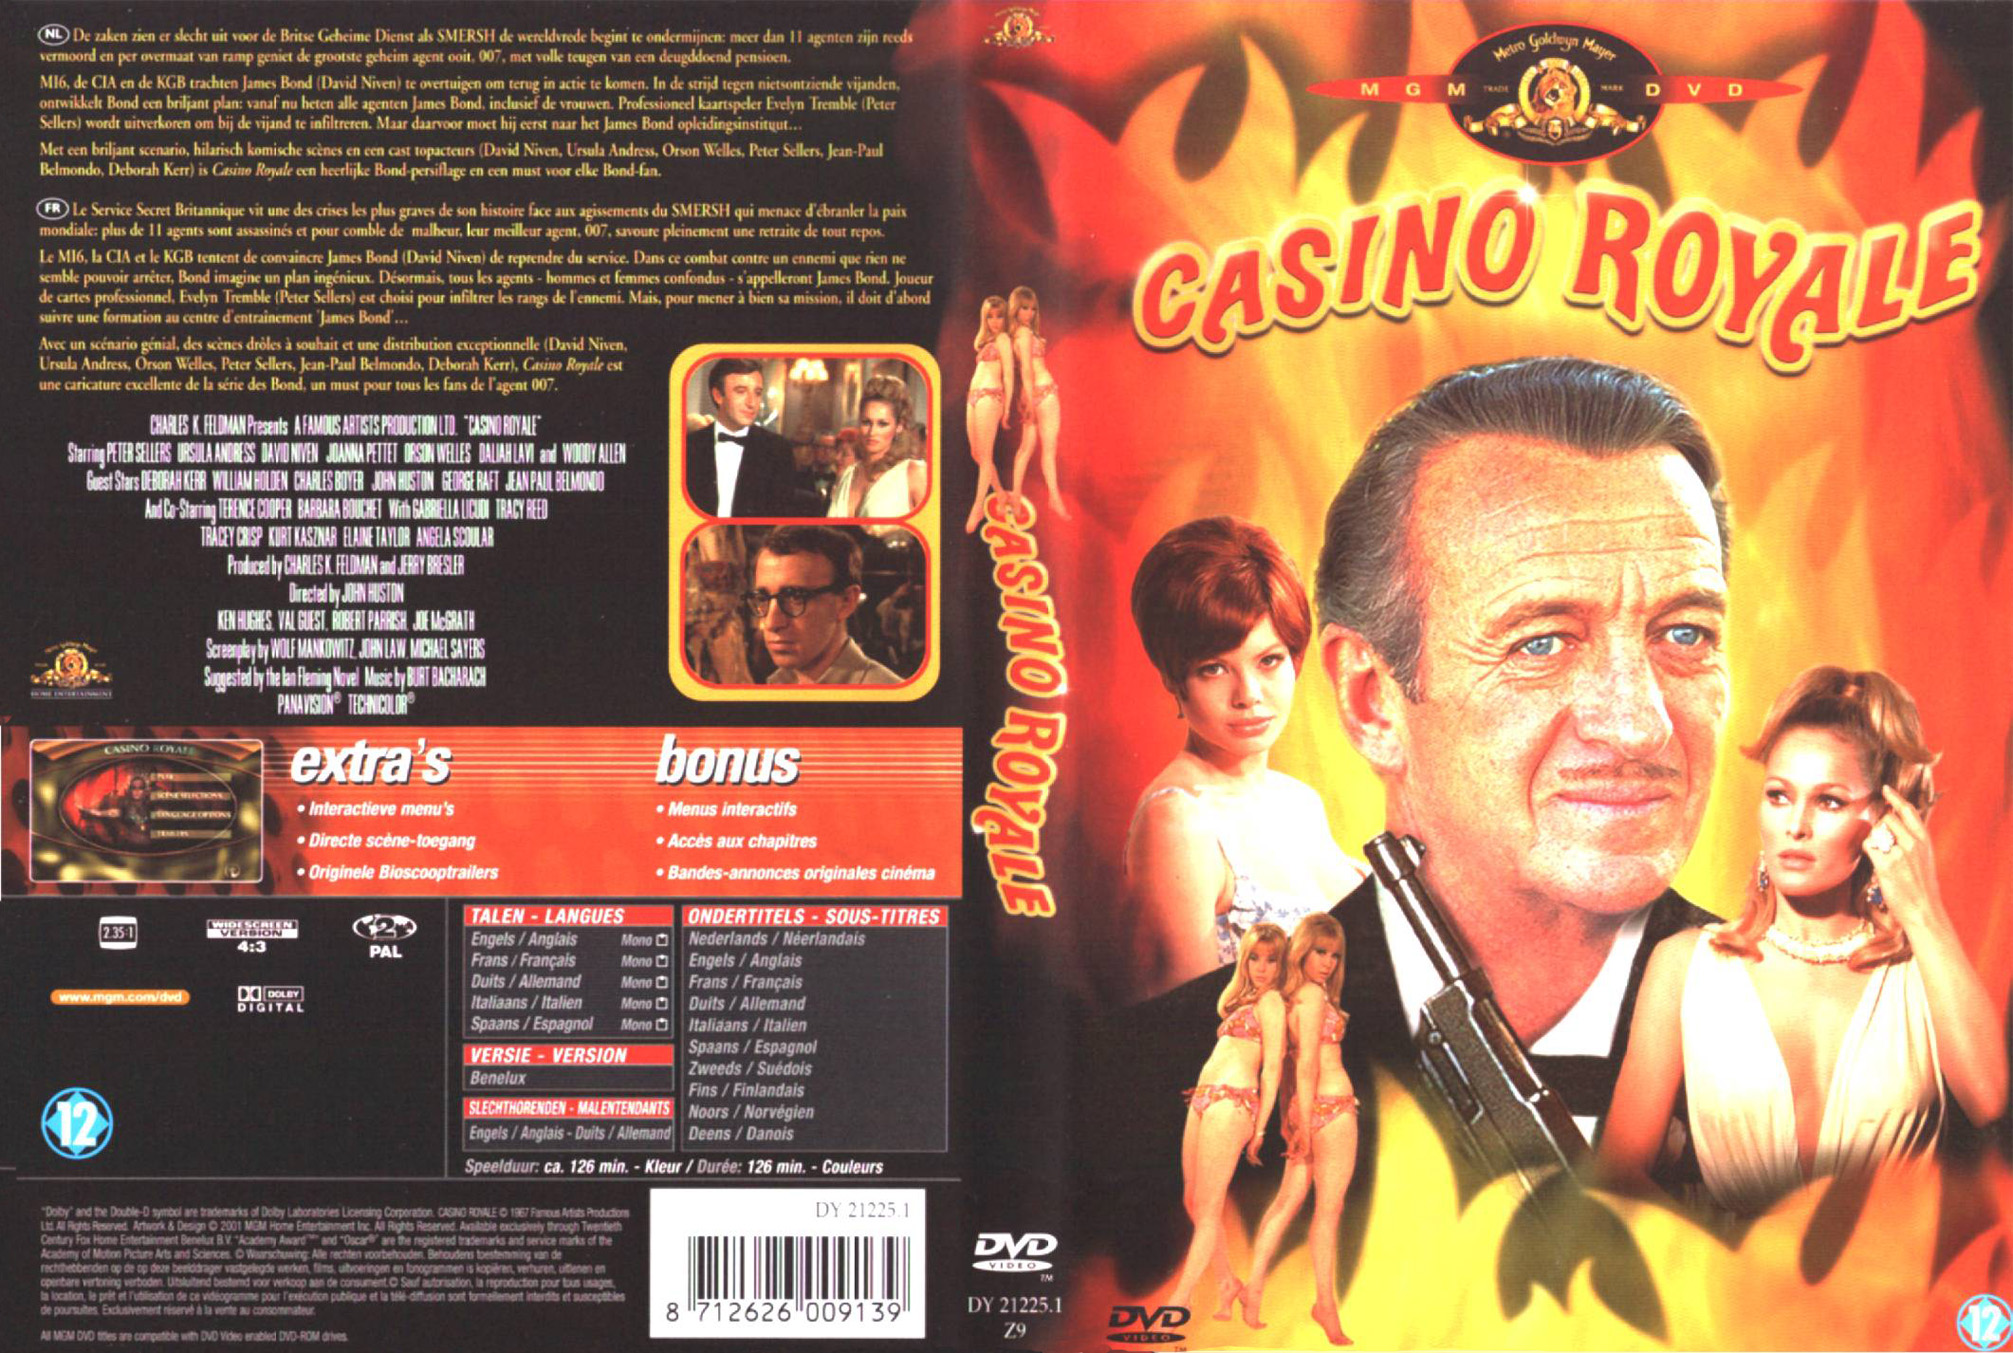 casino royale movie online free hades symbol